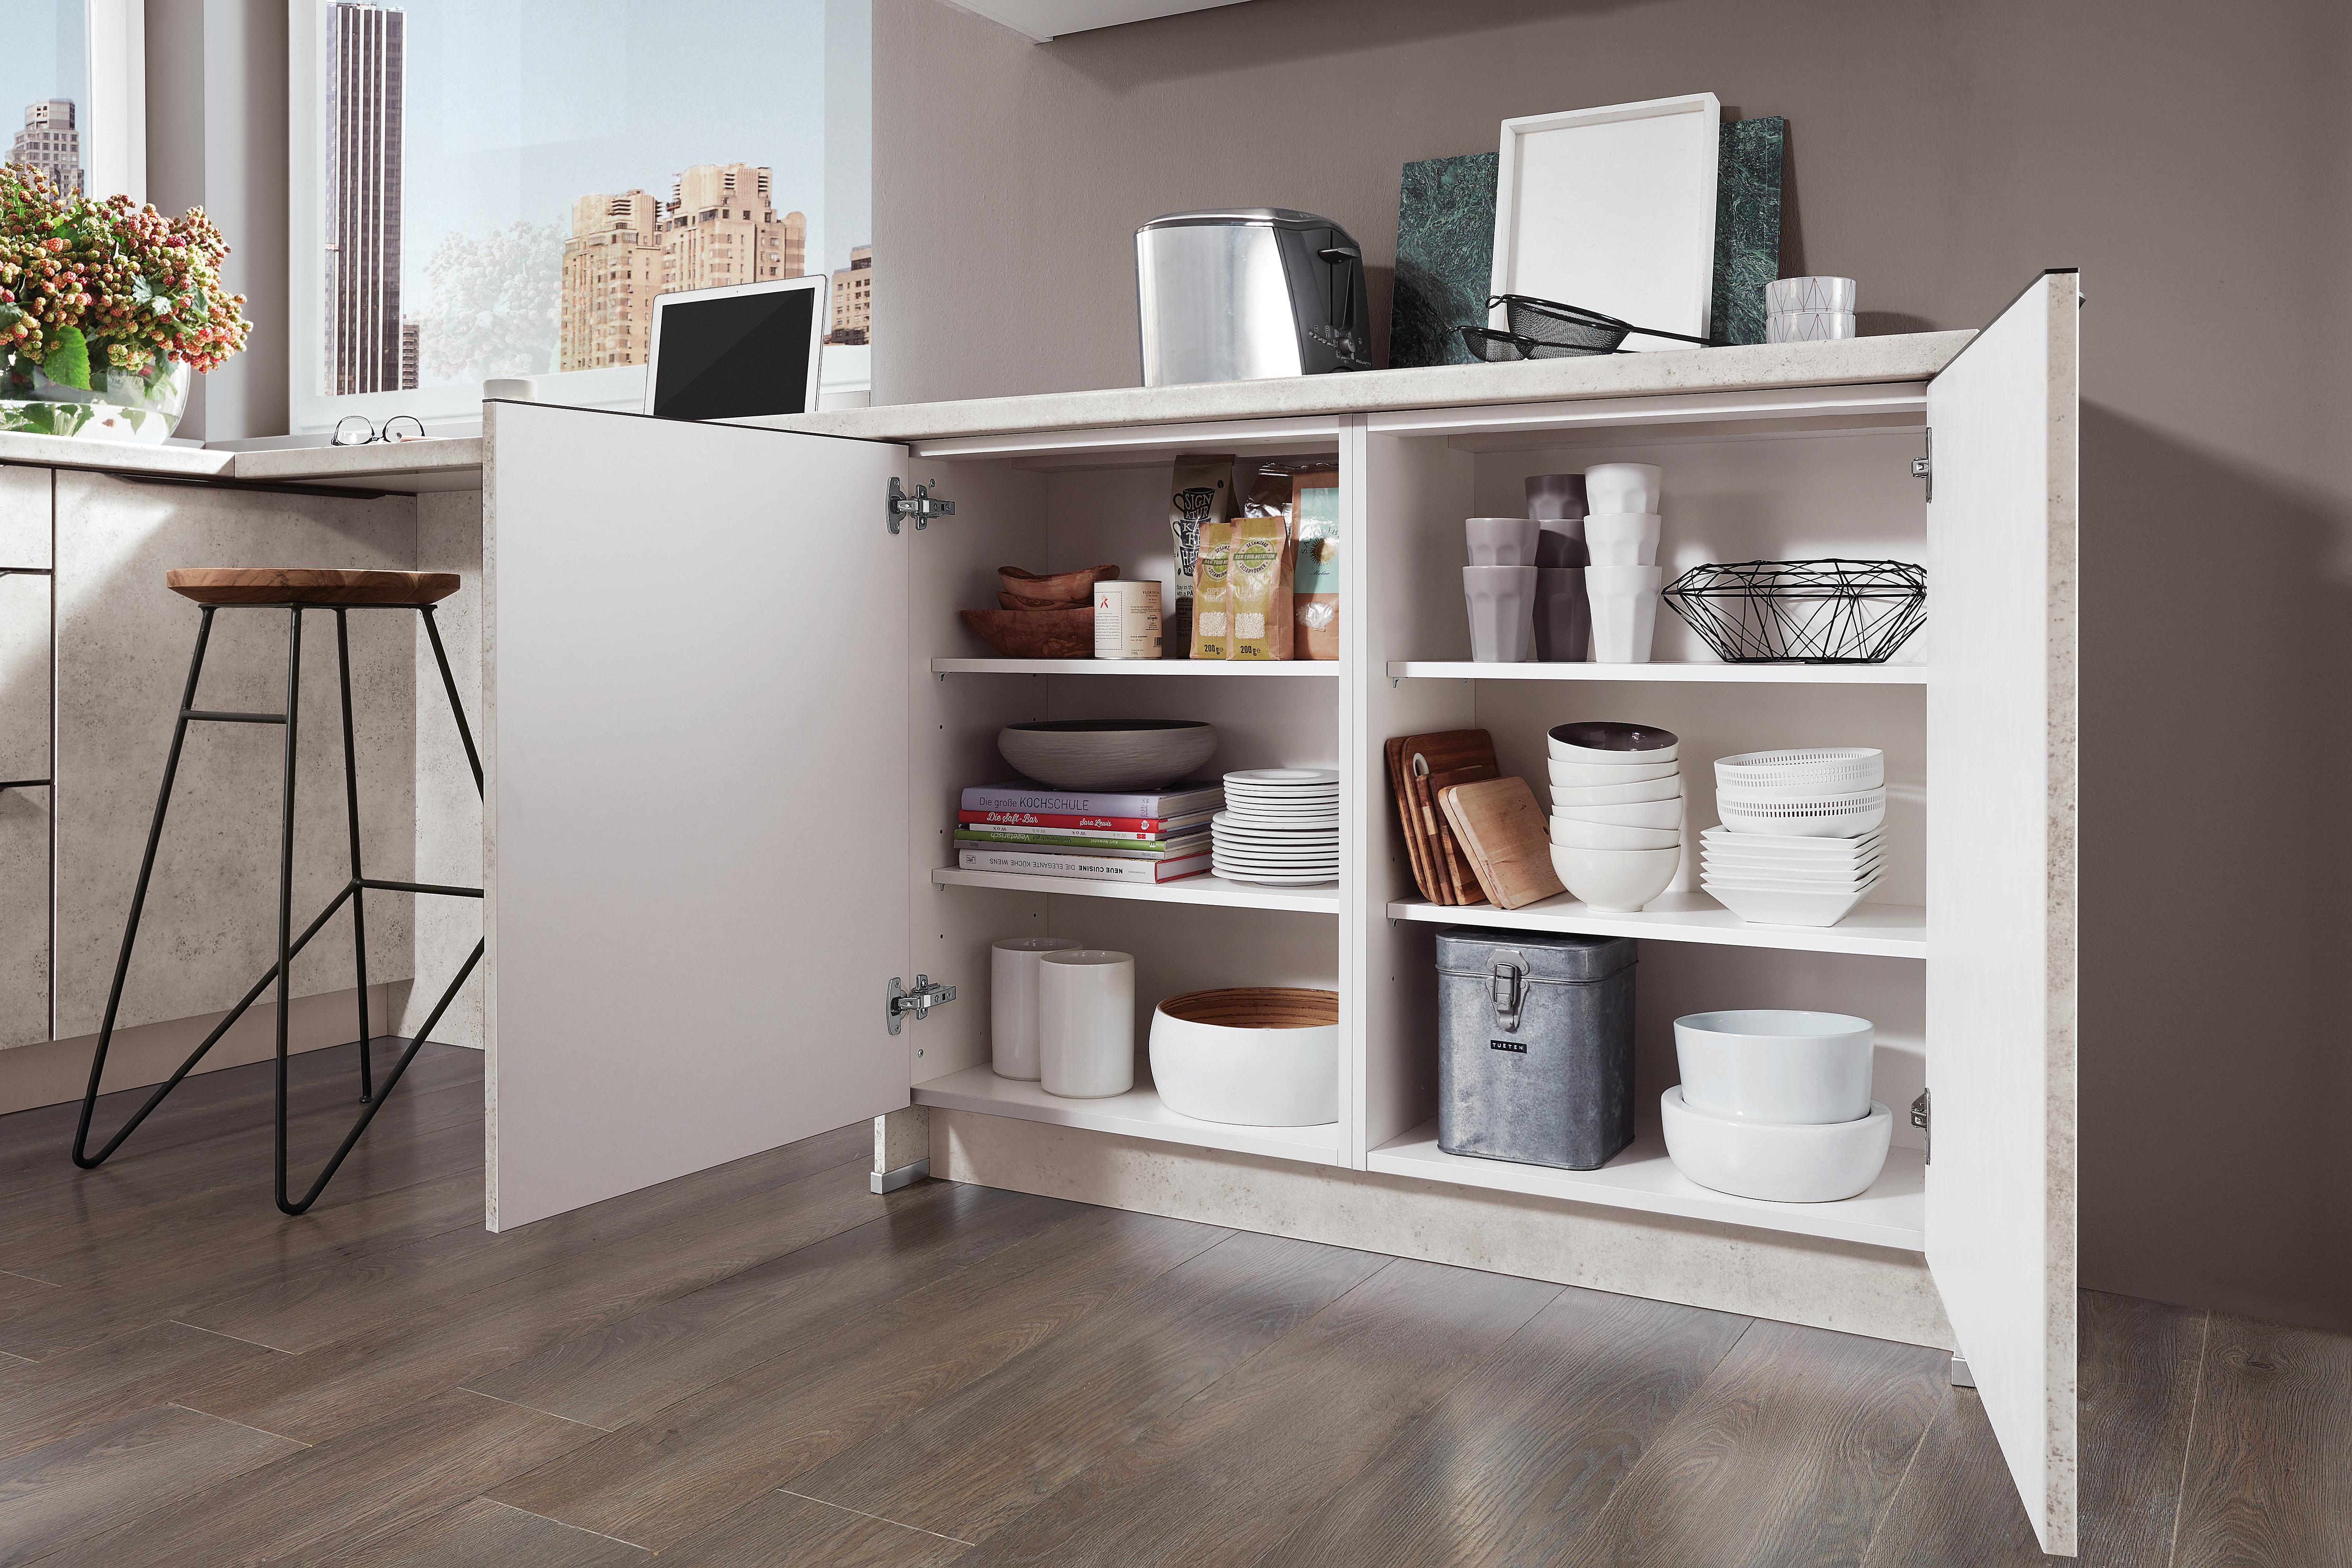 European Kitchen and Bath Cabinets